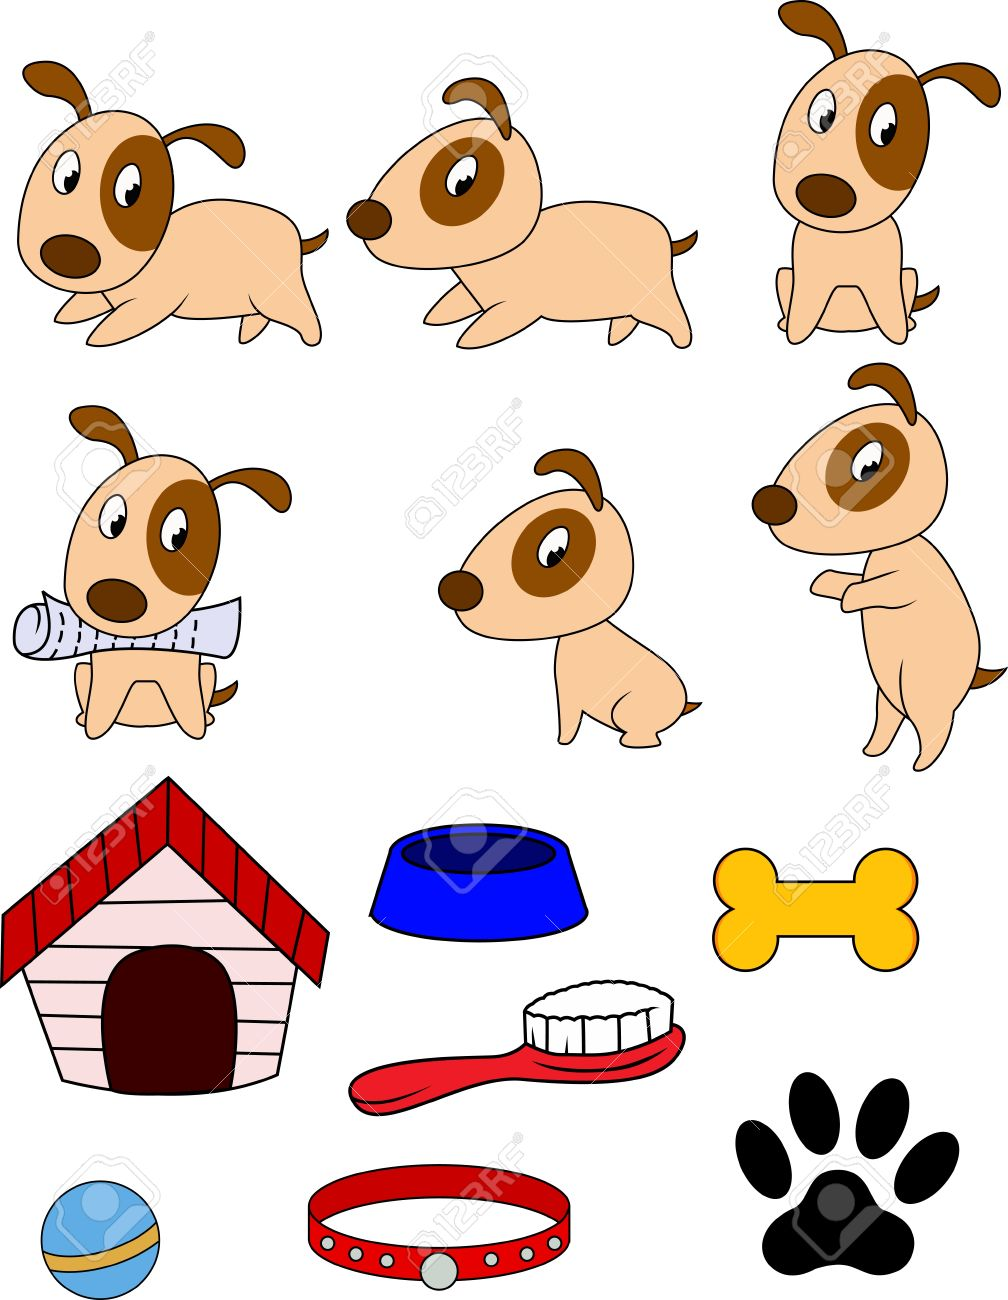 Dog cartoon Stock Vector - 12152499